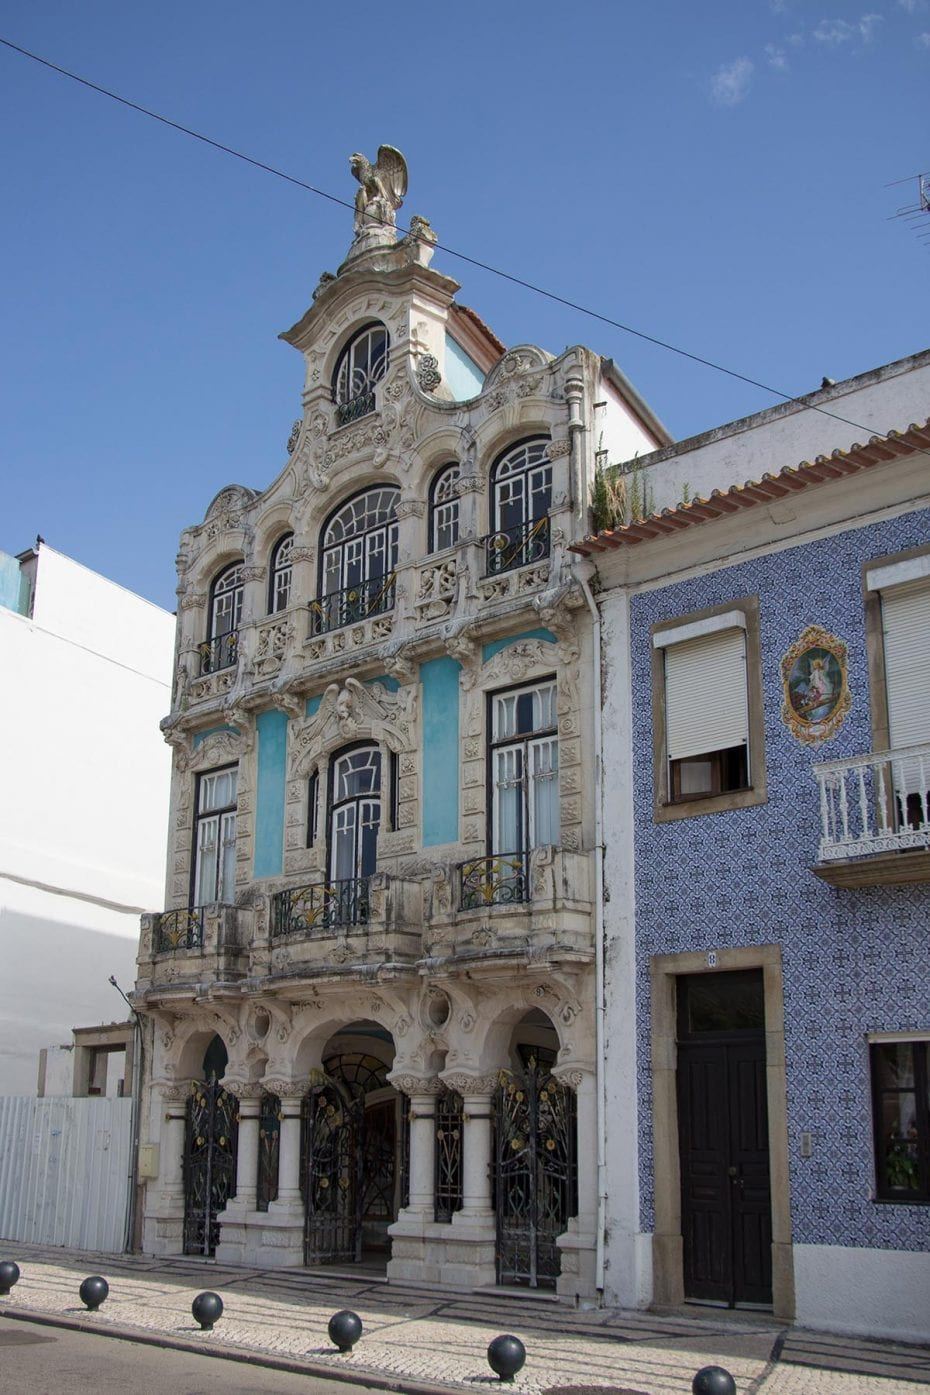 Portugal Aveiro Altstadt Haus im Jugendstil